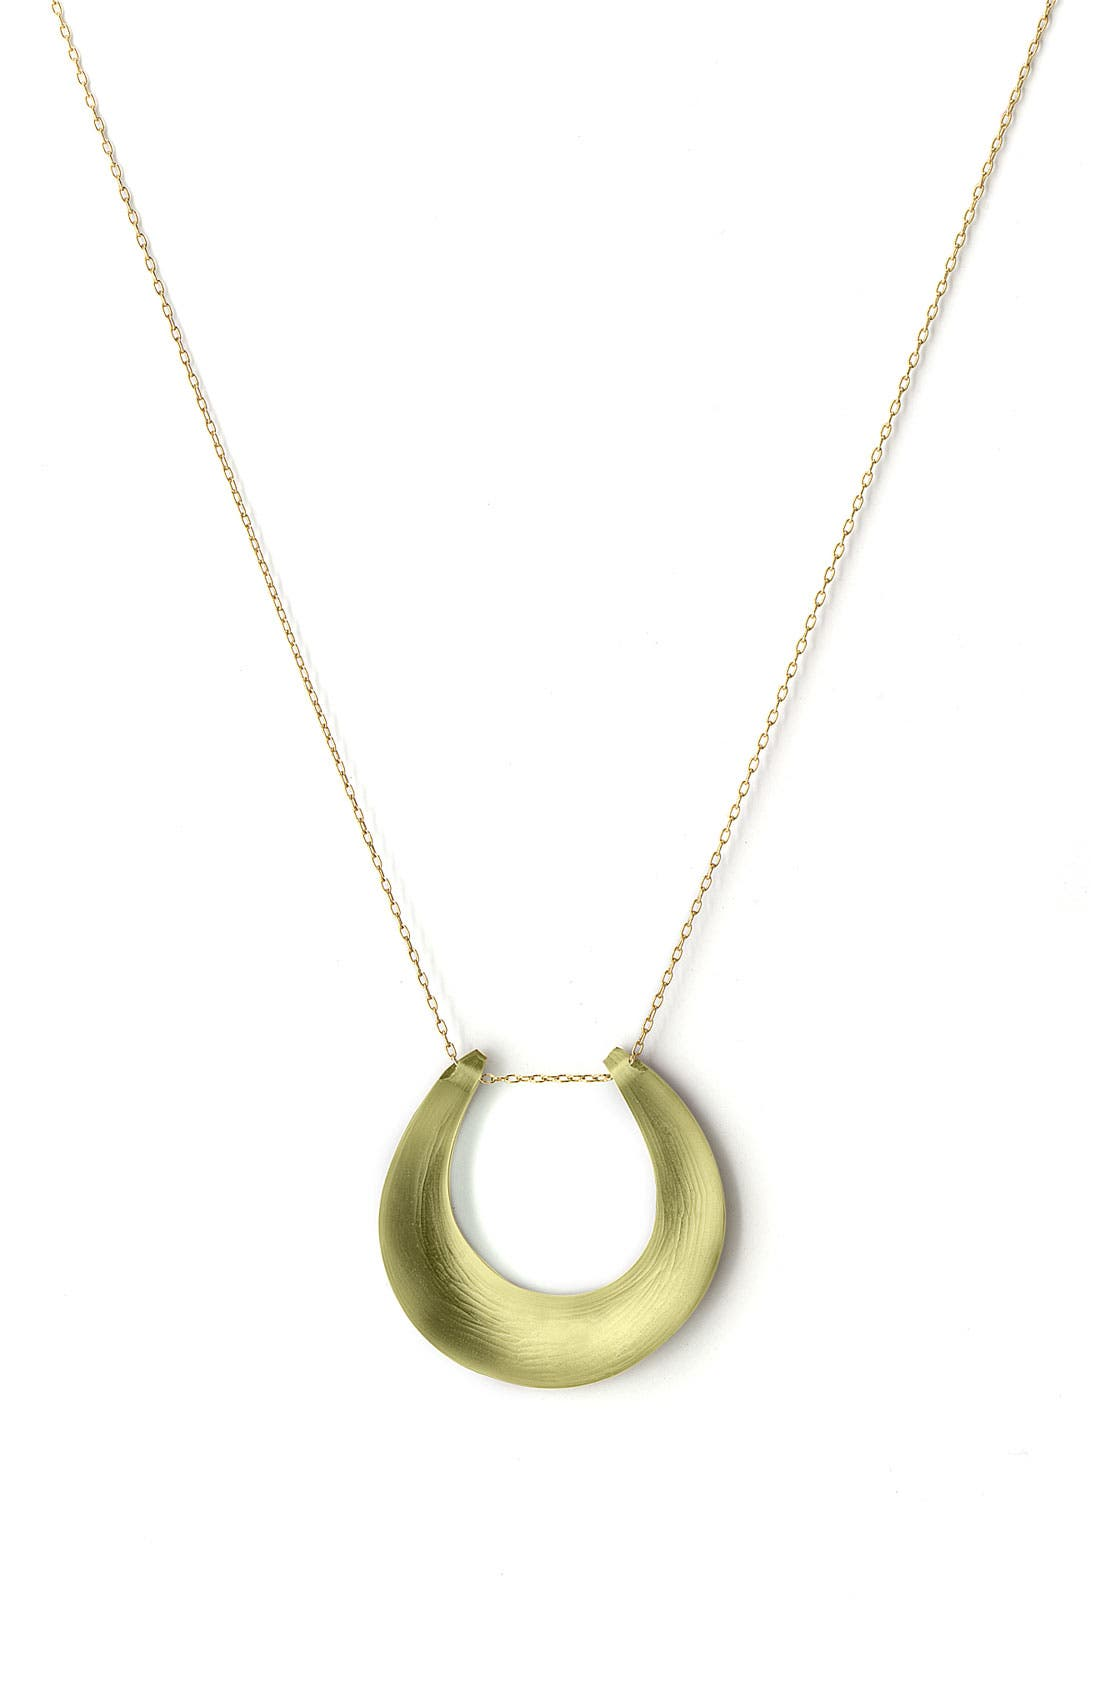 Main Image - Alexis Bittar Small Horseshoe Necklace